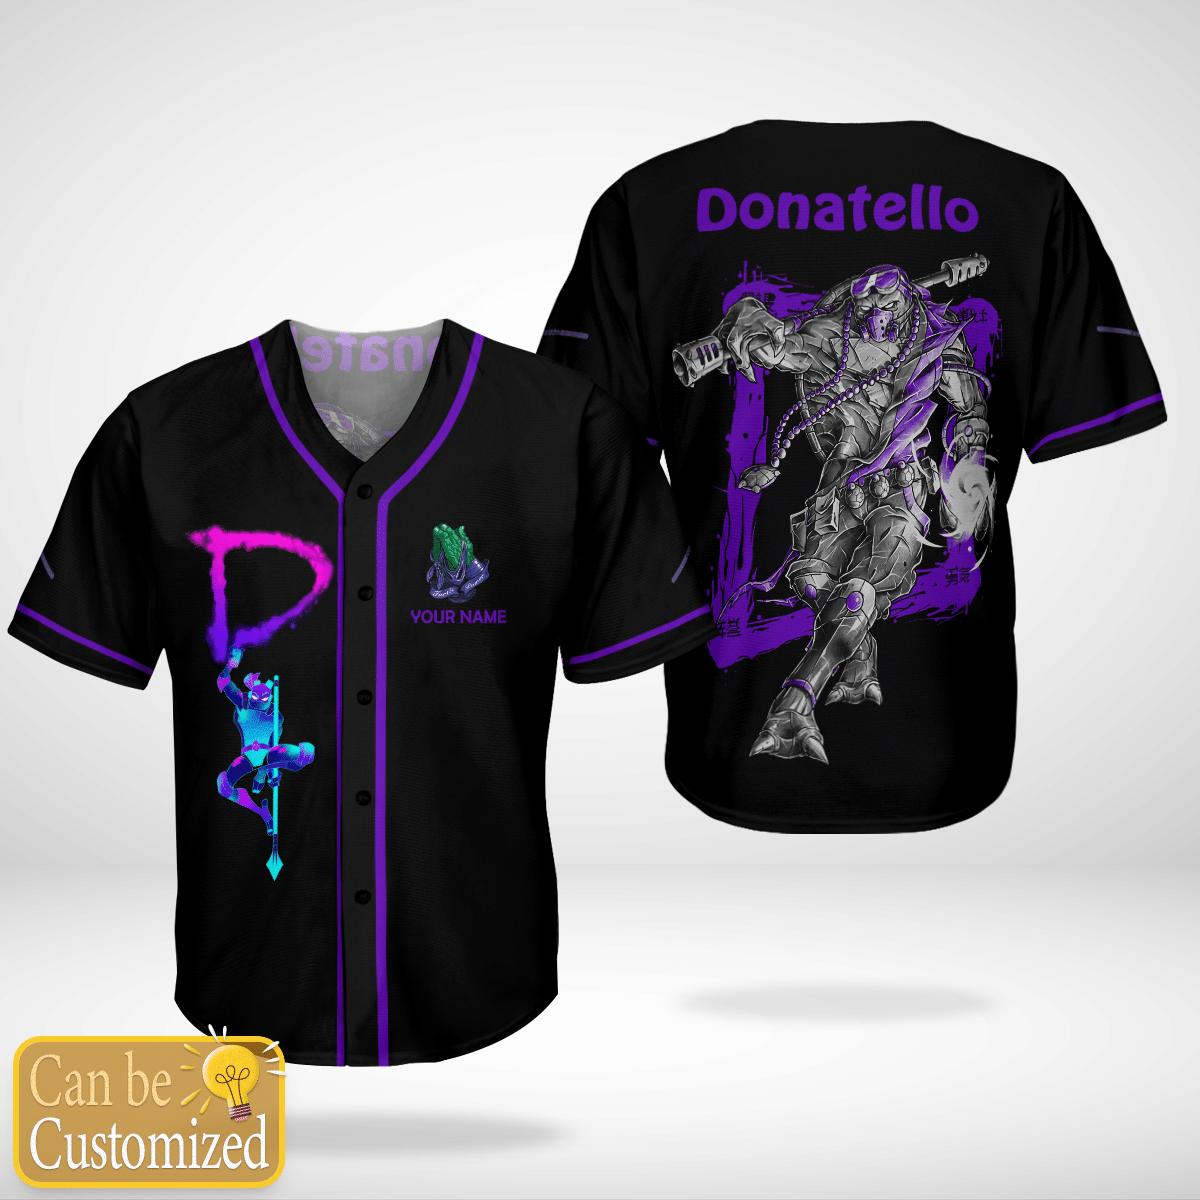 Donnie Donatello Custom Name Baseball Jersey Shirt - LIMITED EDITION